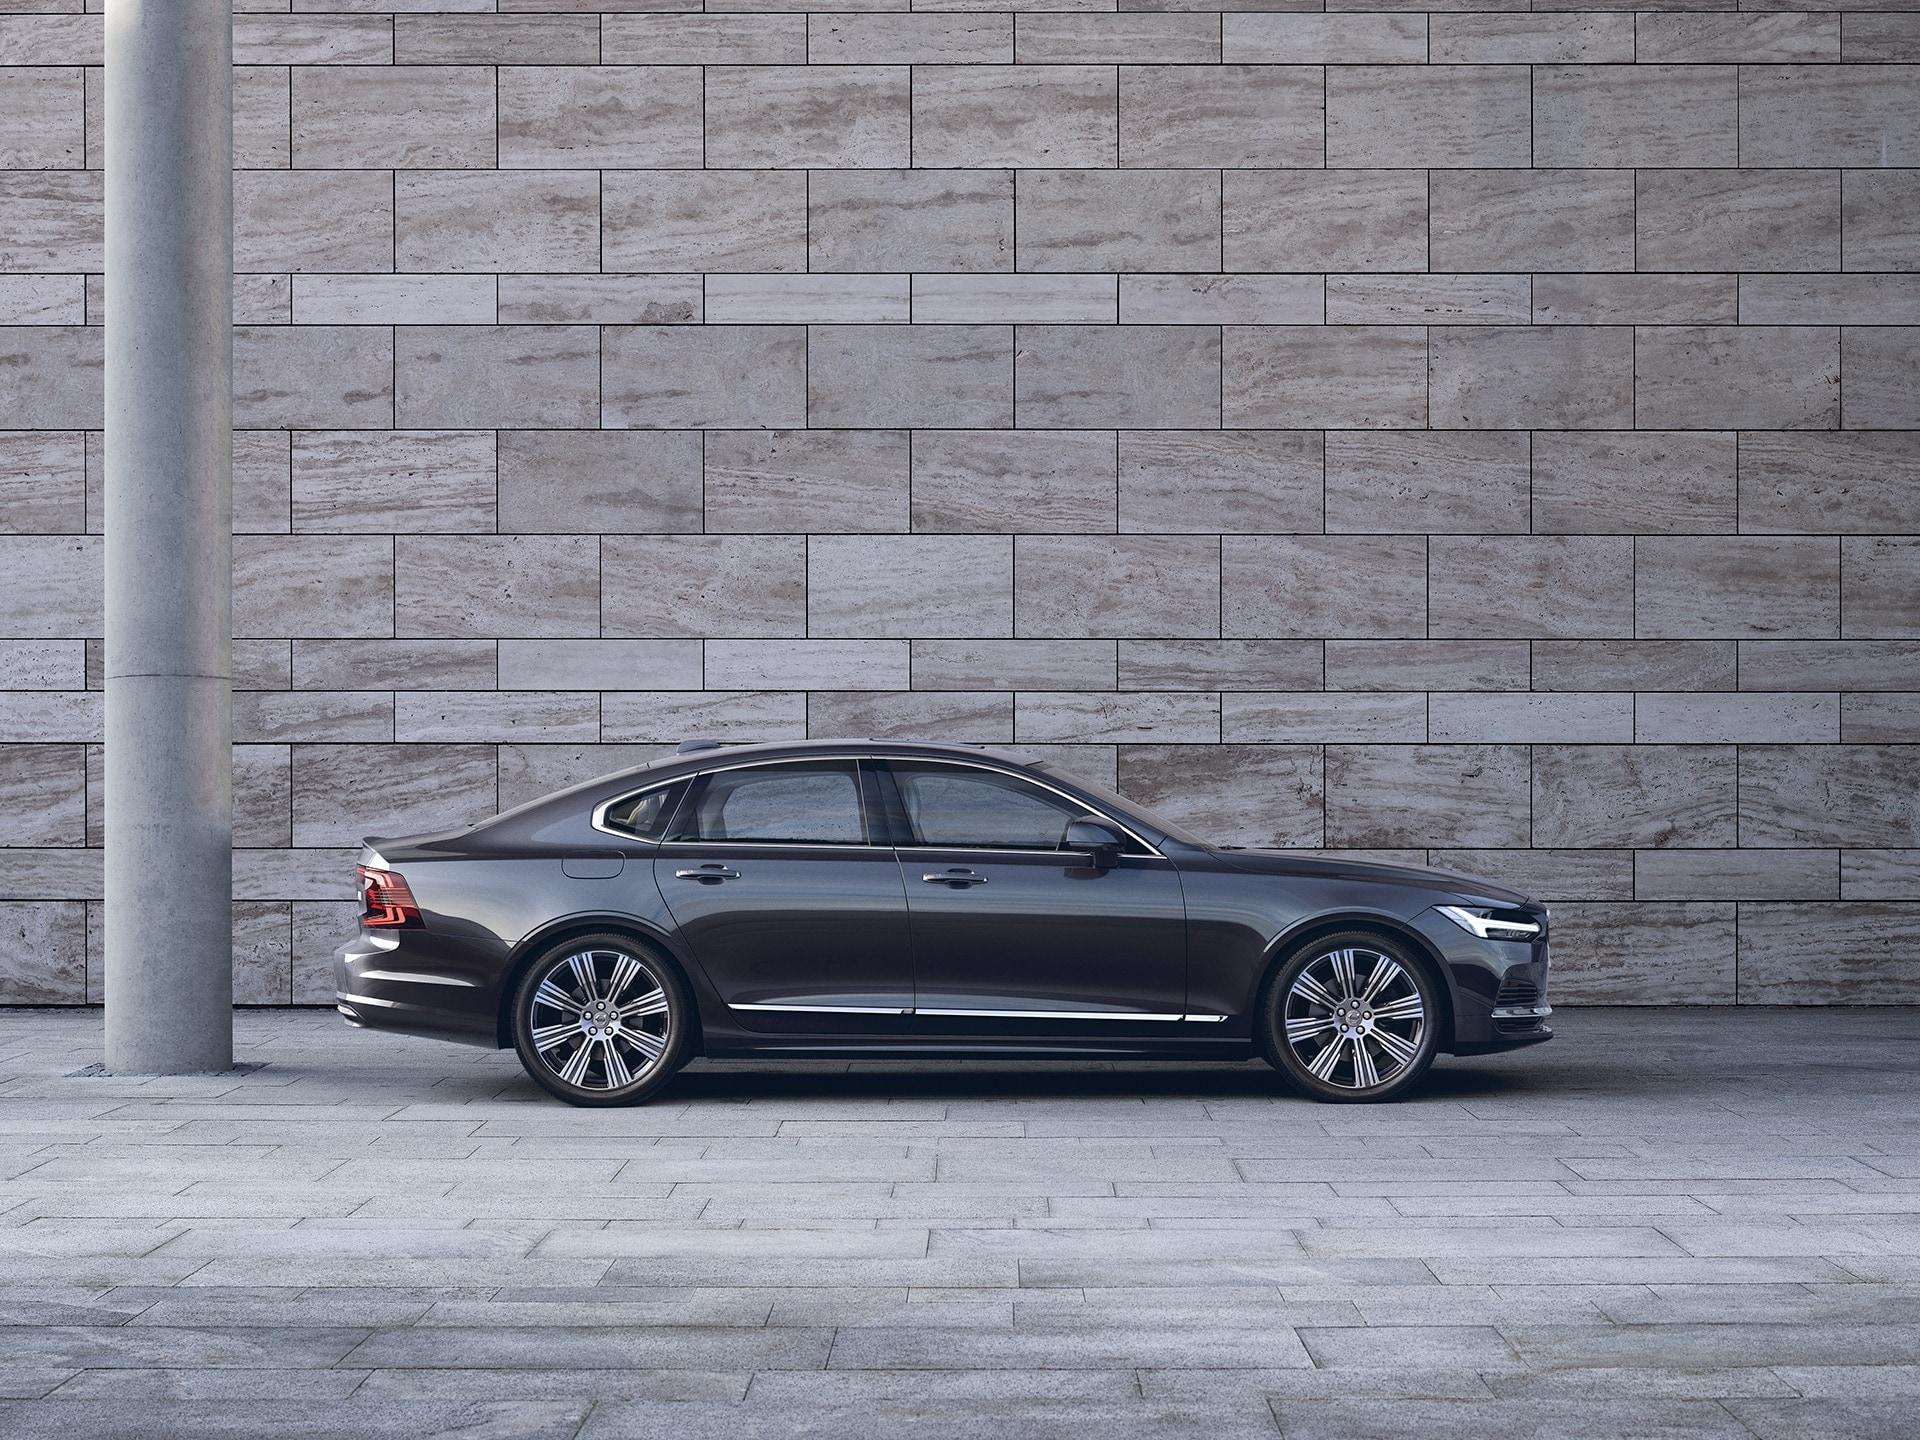 Un Volvo S90 oscuro aparcado frente a un muro gris